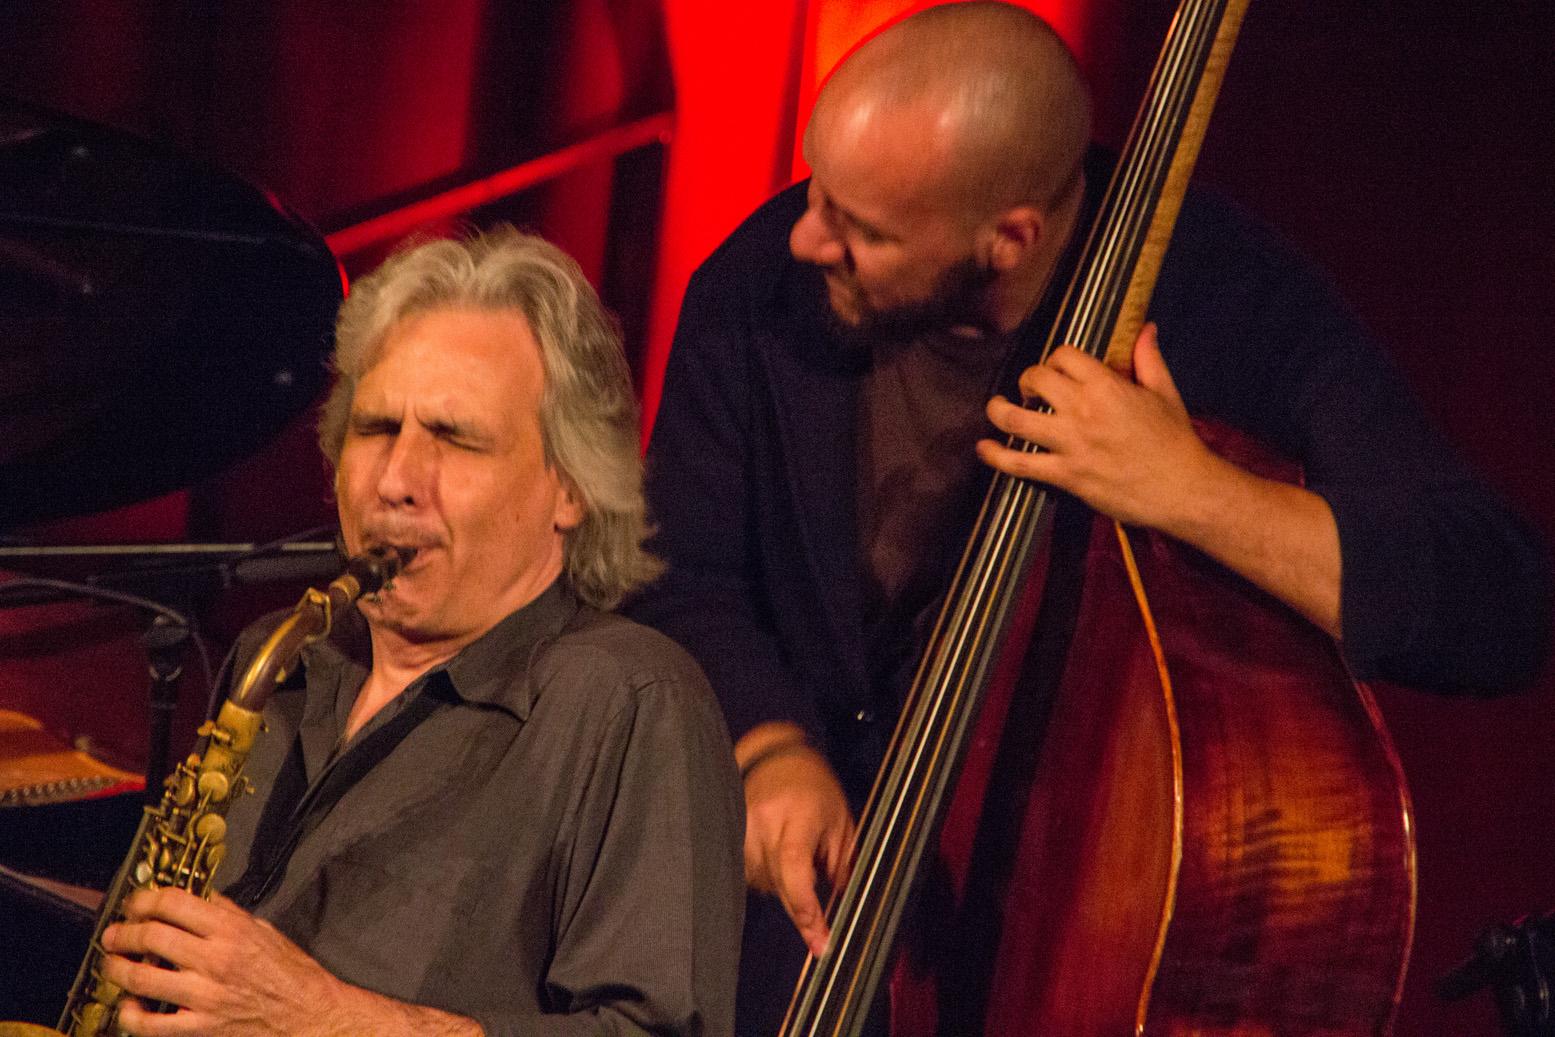 Perico sambeat and alex davis at cork jazz festival